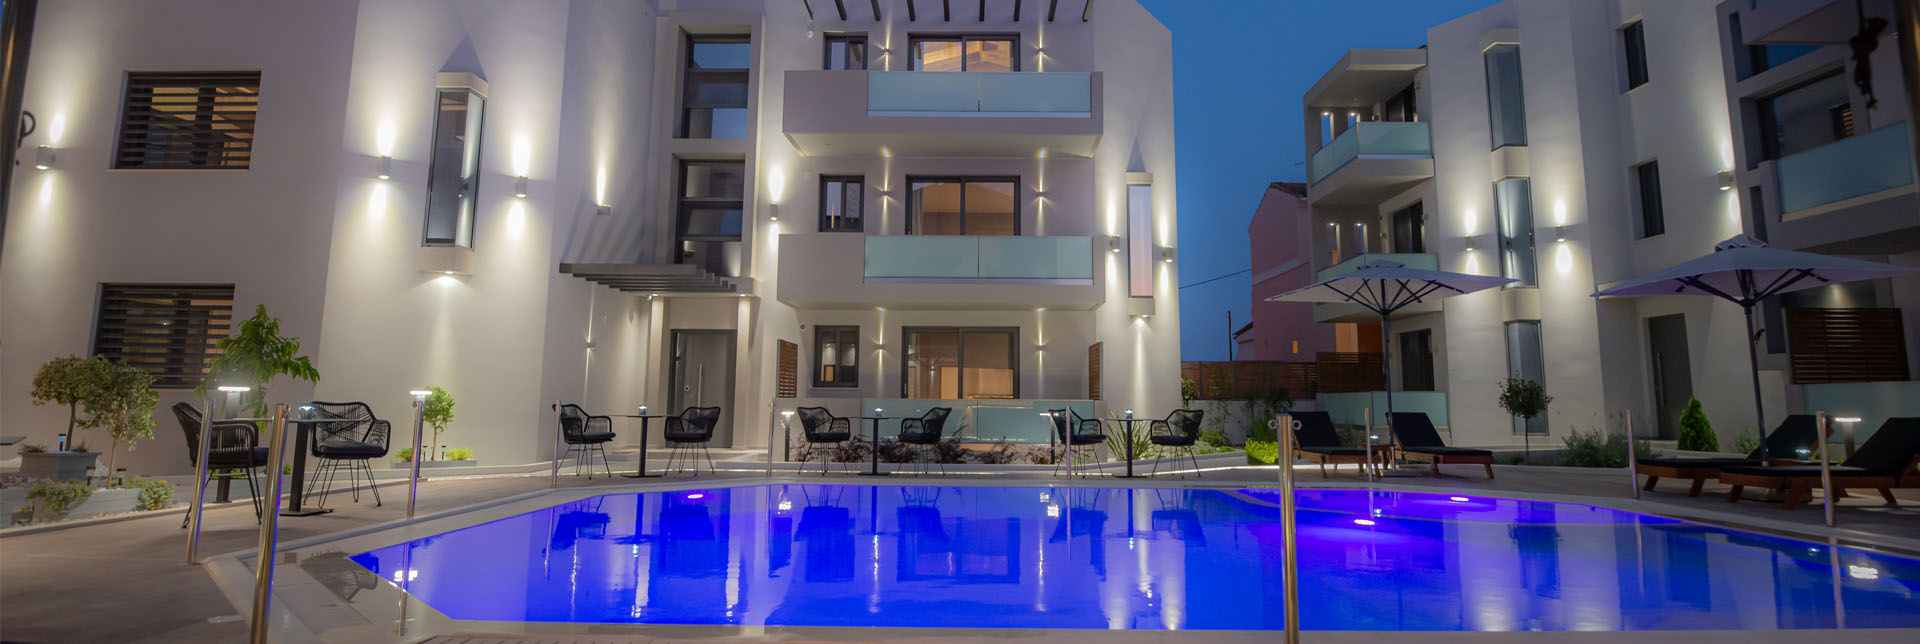 The Victoria Lefkada Suites Lofts Apartments Studios Gallery